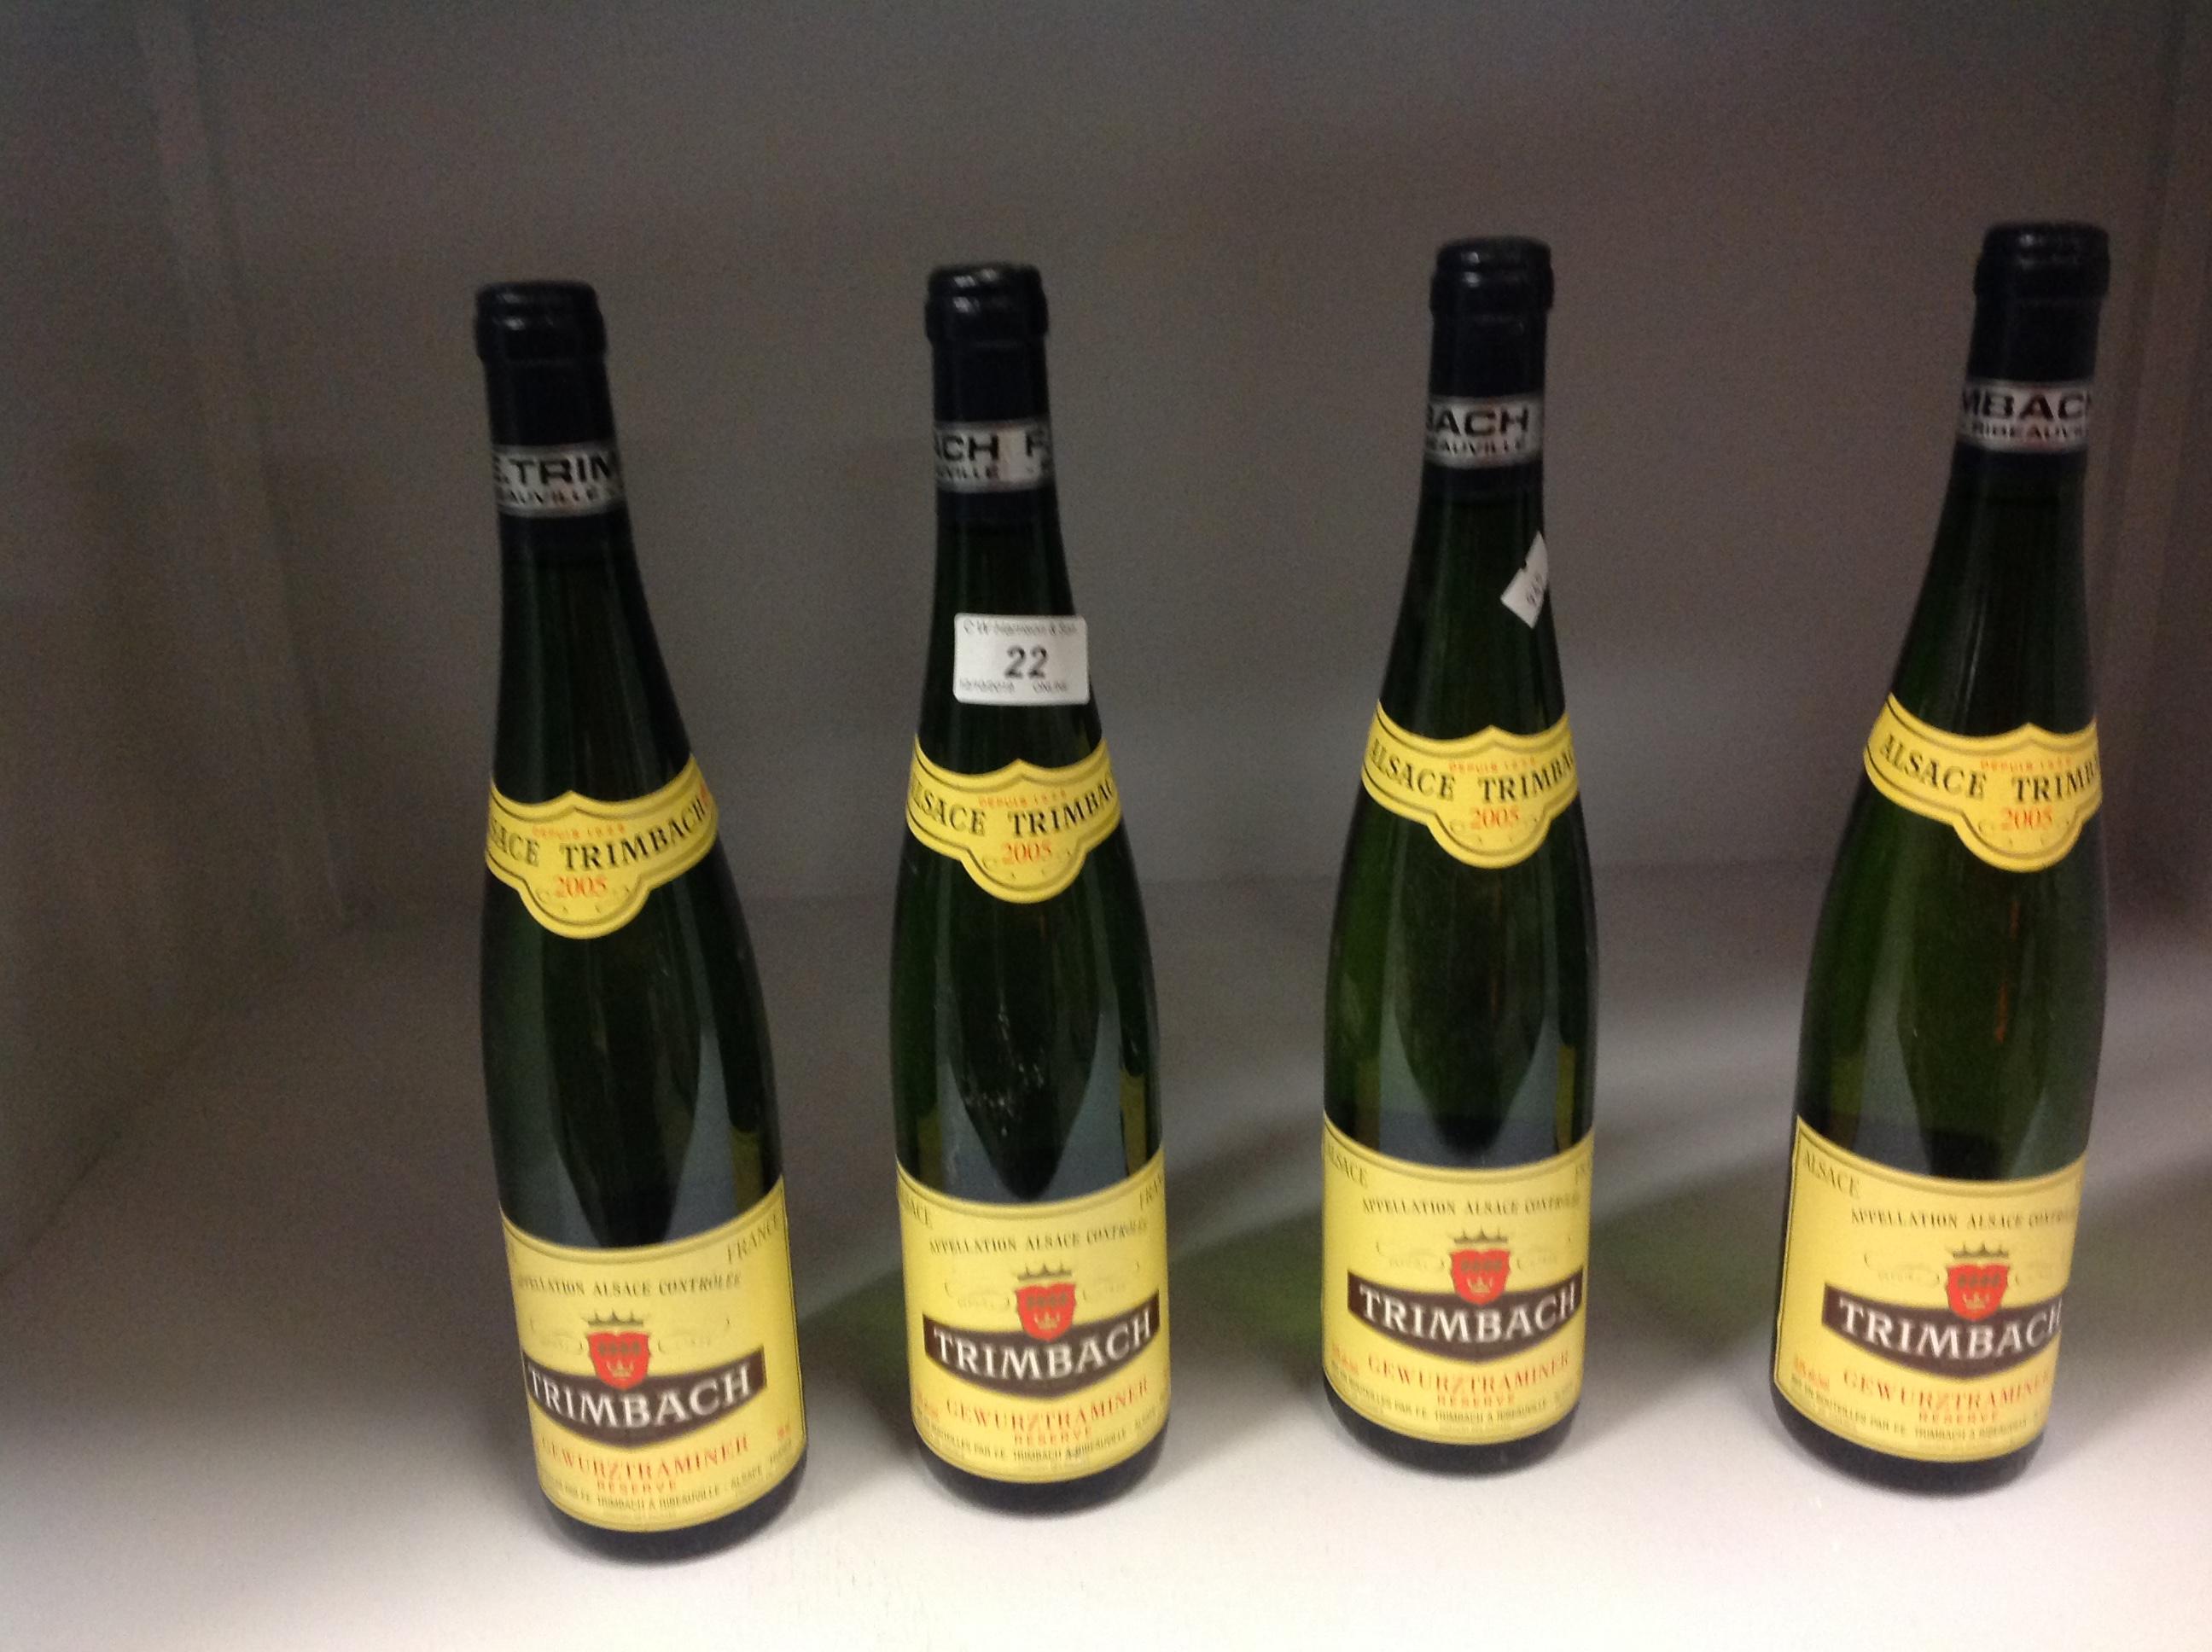 Lot 22 - 4 x 750ml bottles Trimbach Gewurztramine